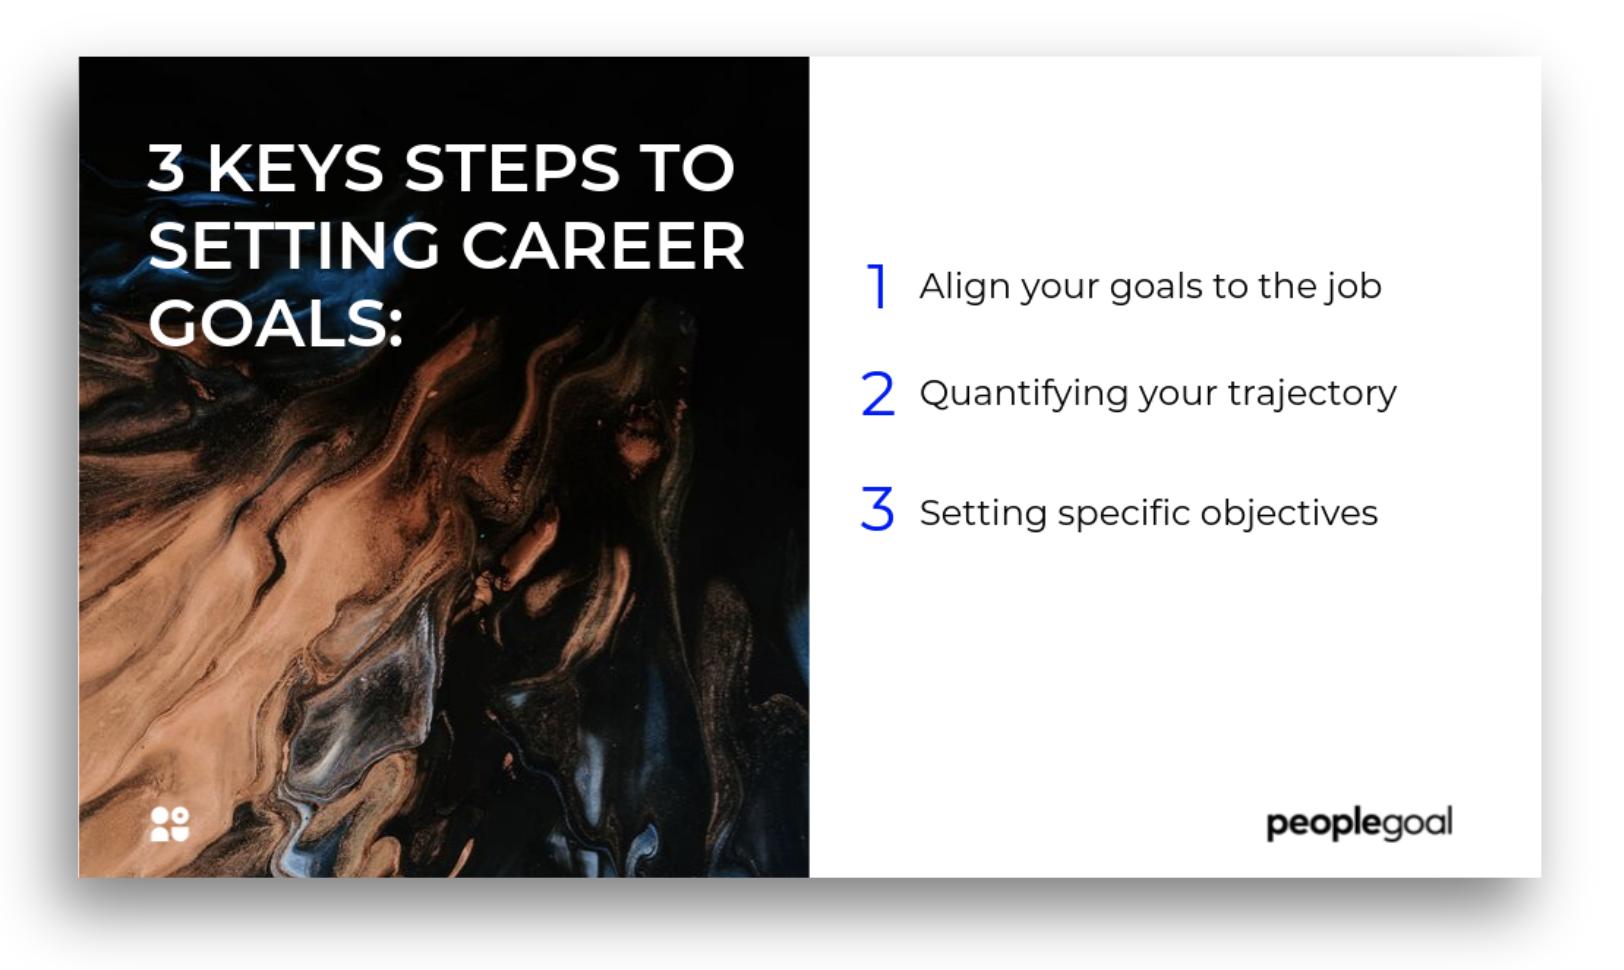 3 key steps to setting career goals